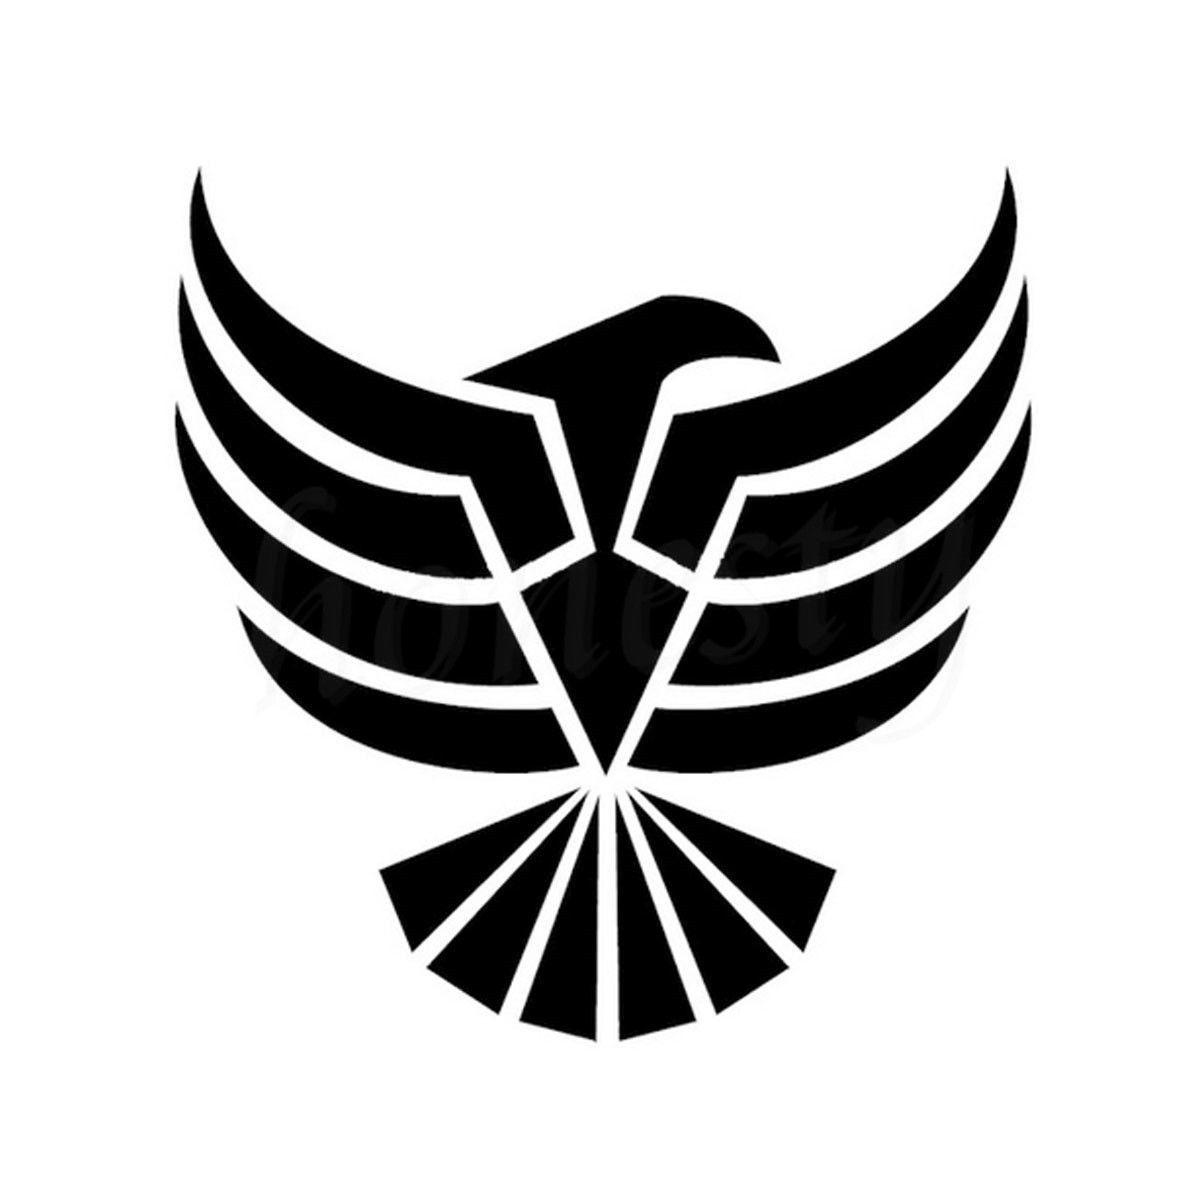 Car sticker eagle - Reich Majestic Eagle Totem Warrior Car Sticker Truck Window Wall Home Glass Door Laptop Black Vinyl